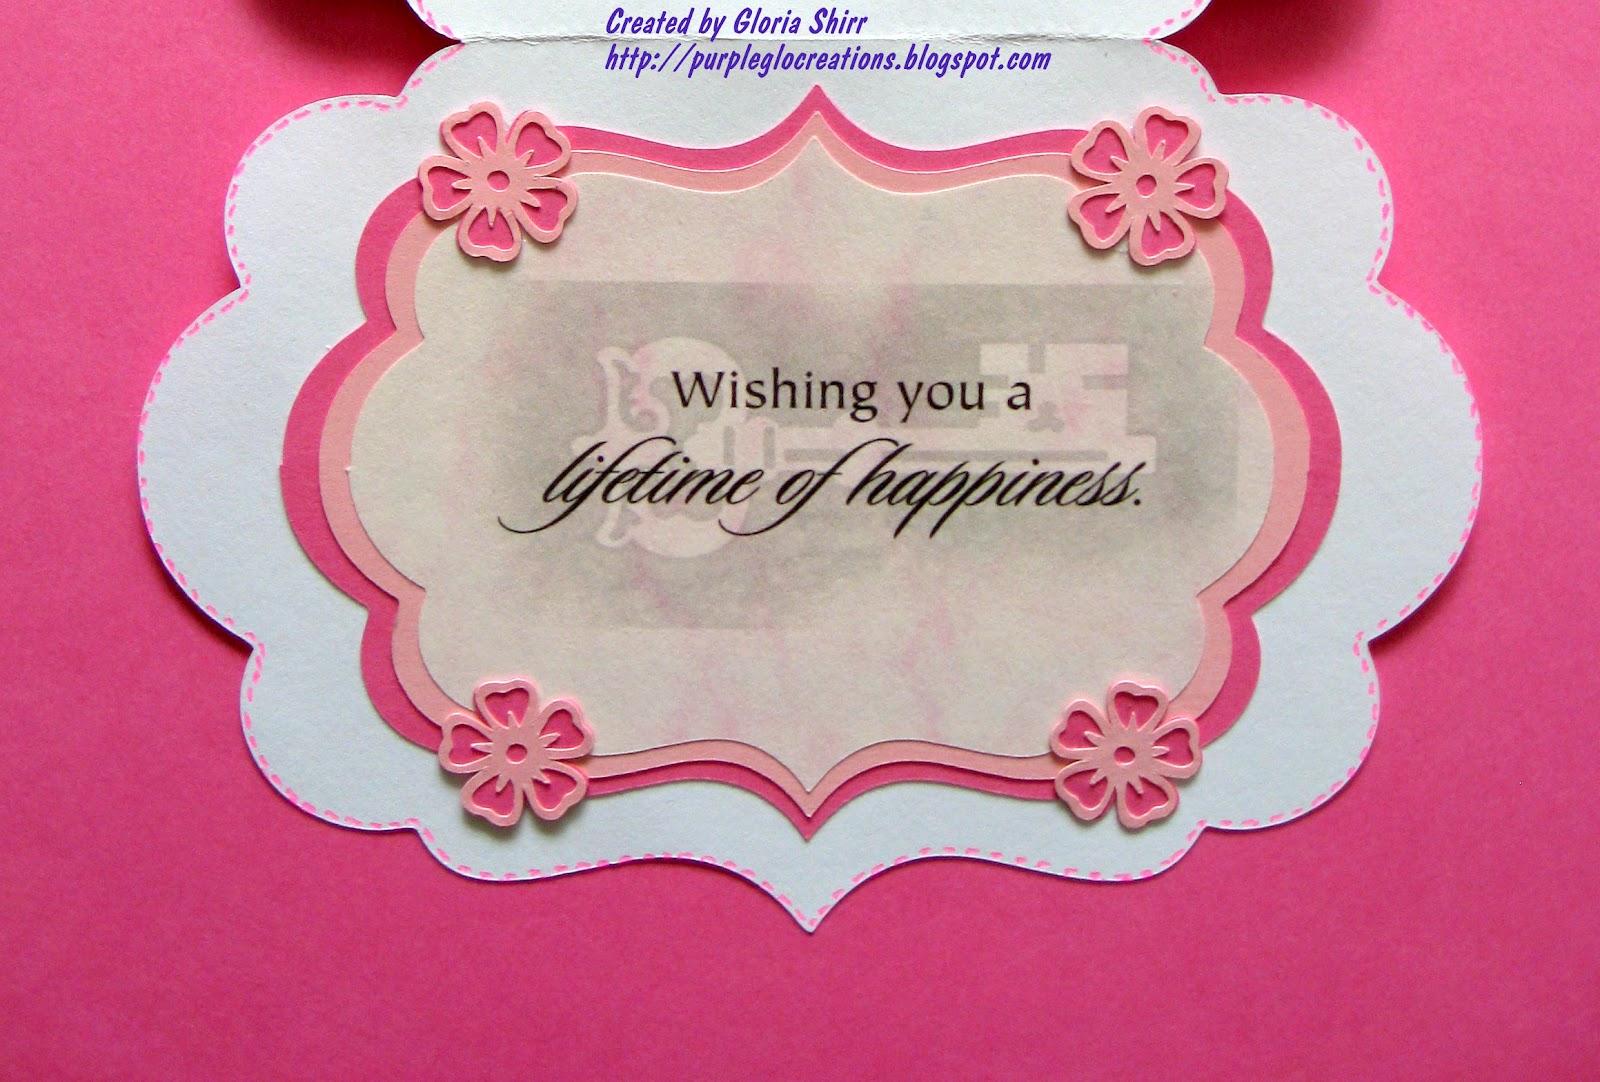 Purpleglo creations happy anniversary card using cricut